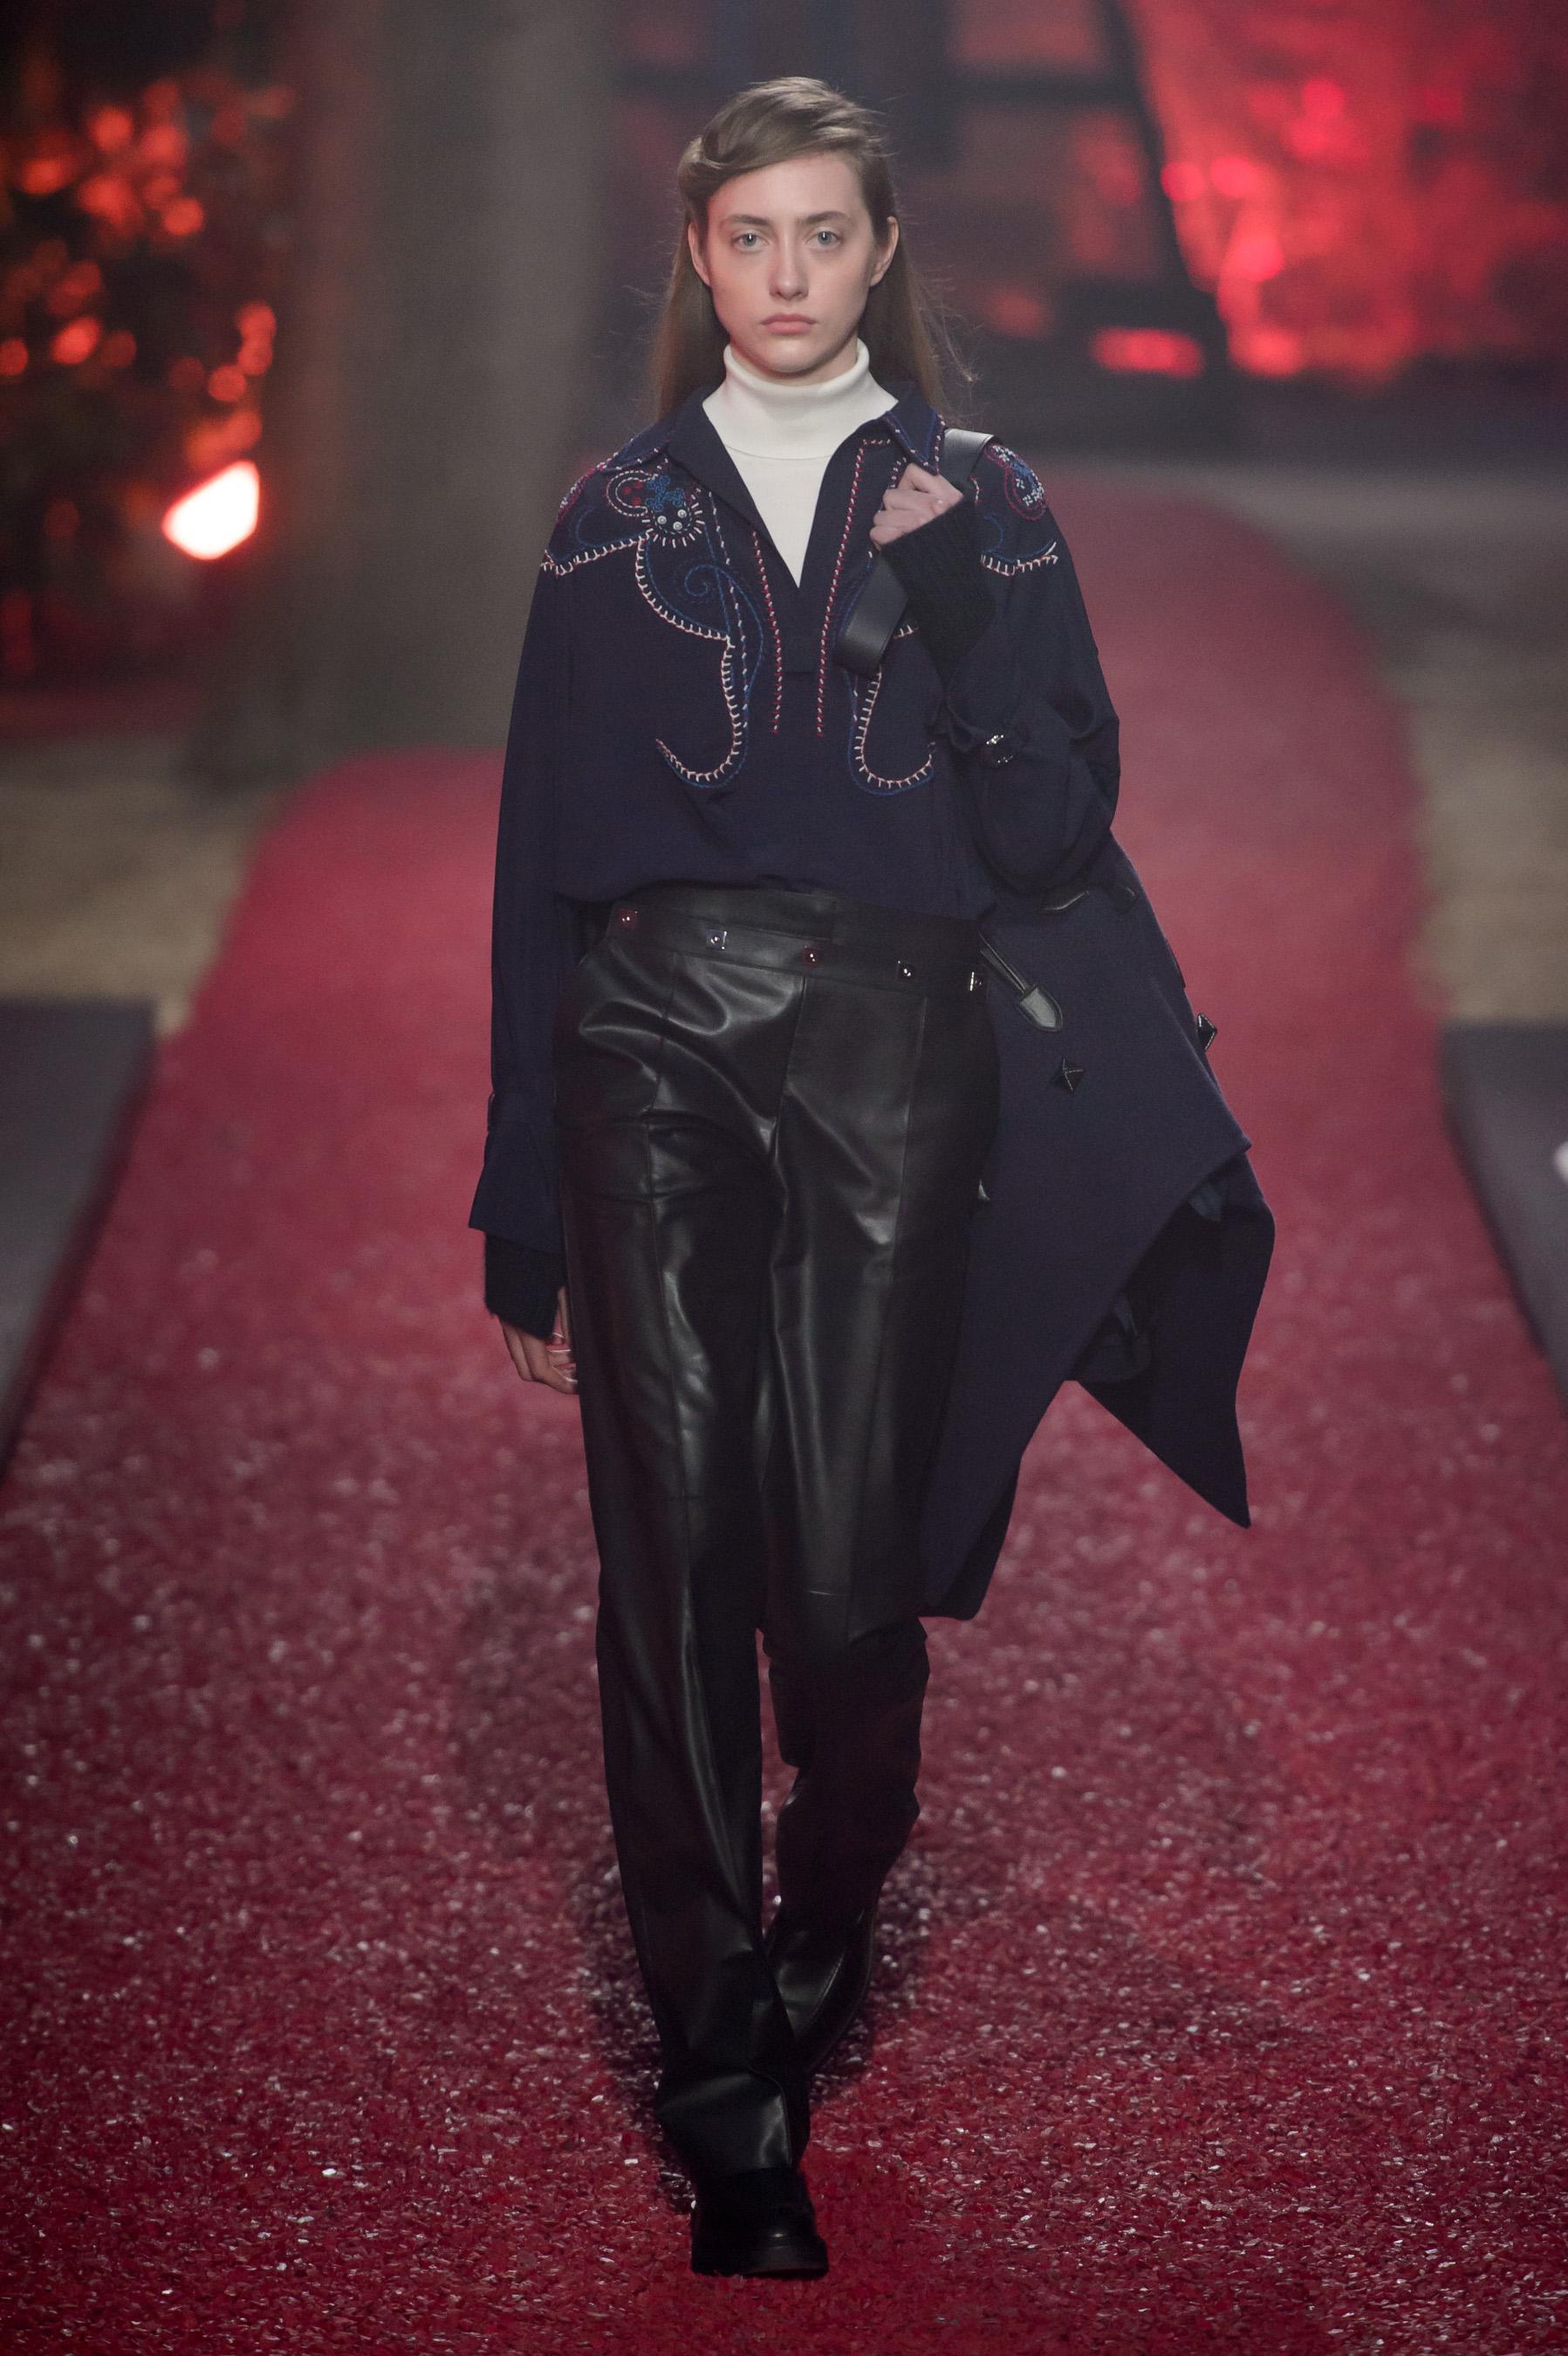 6cd0bdd09661 Défilé Hermès automne-hiver 2018-2019, Paris - Look 20. Défilé Hermès Prêt -à-porter automne-hiver 2018-2019 Paris - photo 20 Imaxtree